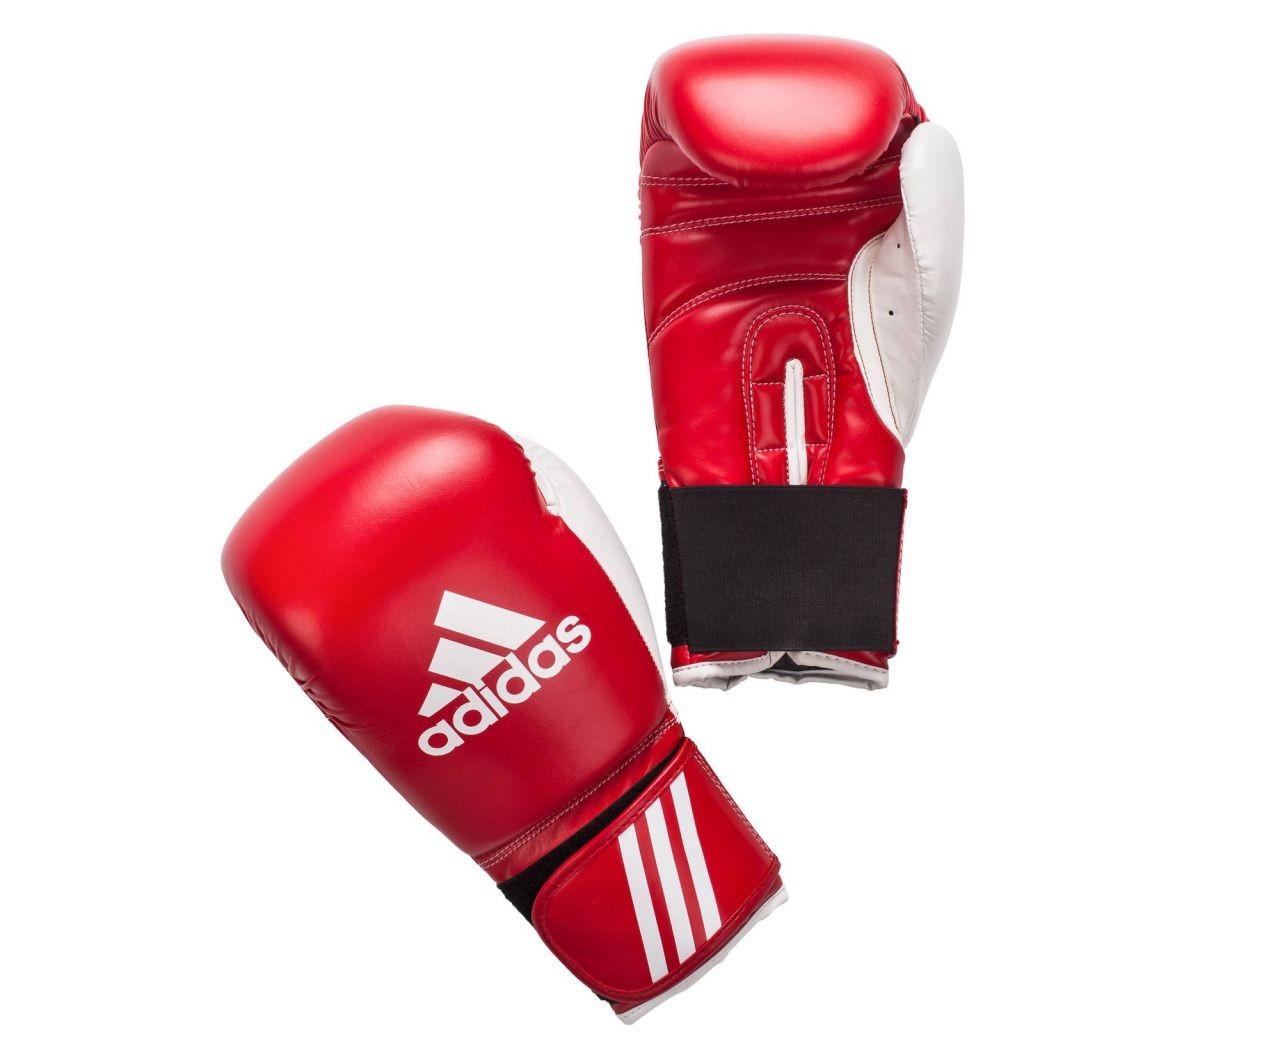 Перчатки боксерские adidas response красно-белые adibto1